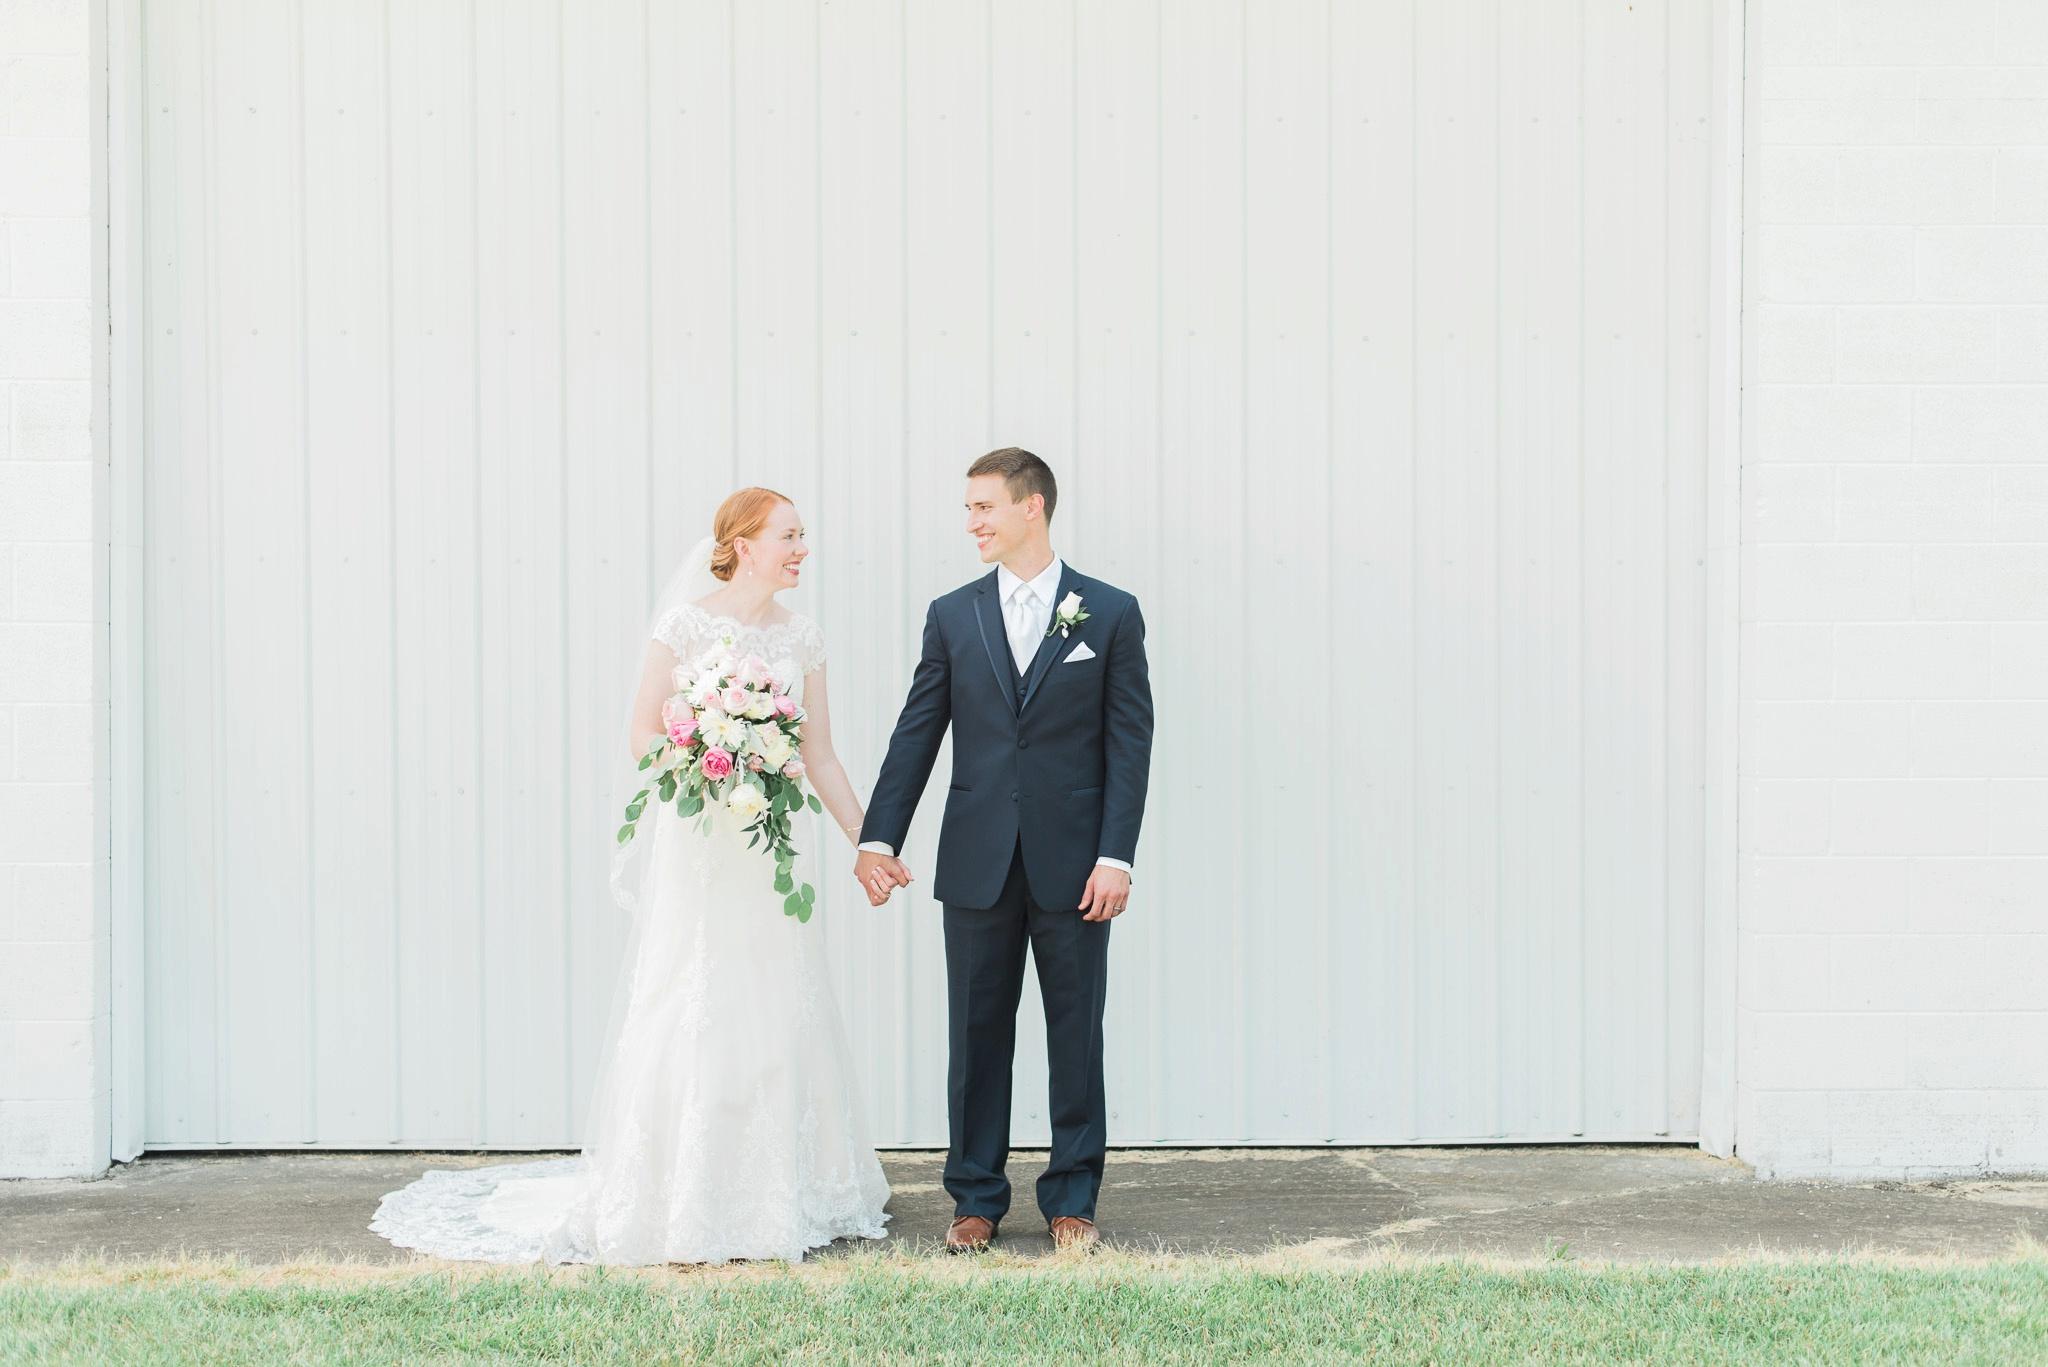 sunbury-ohio-wedding-hannah-johnathan_0076.jpg